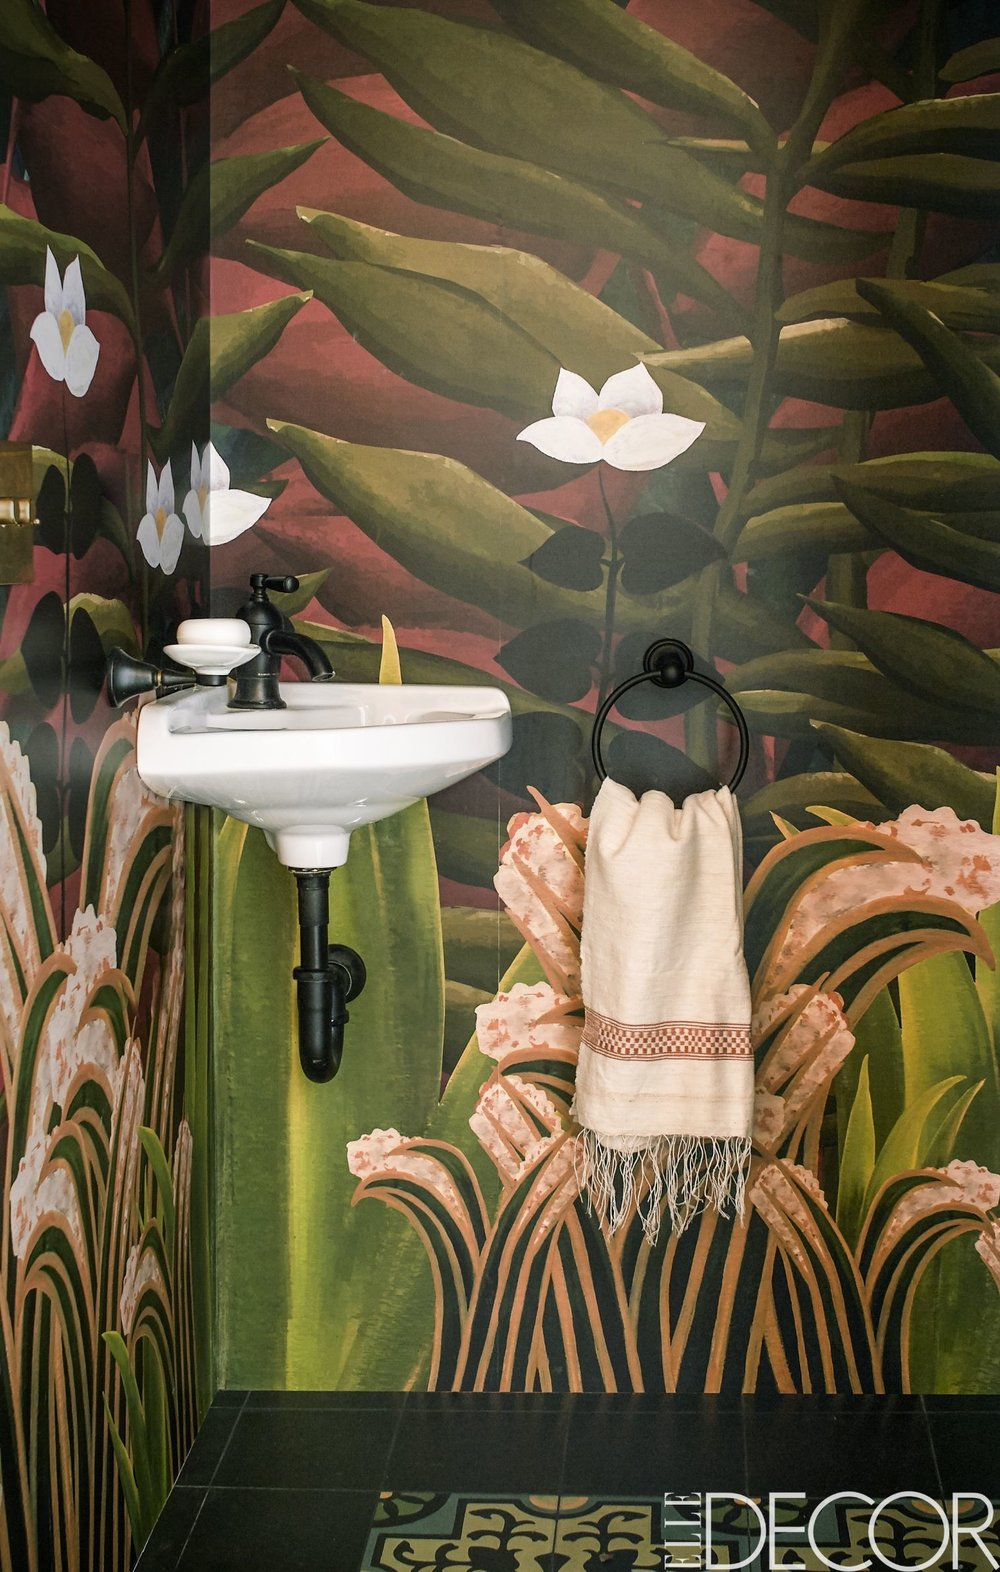 elle-decor-west-village-home-bathroom-1492019356.jpg